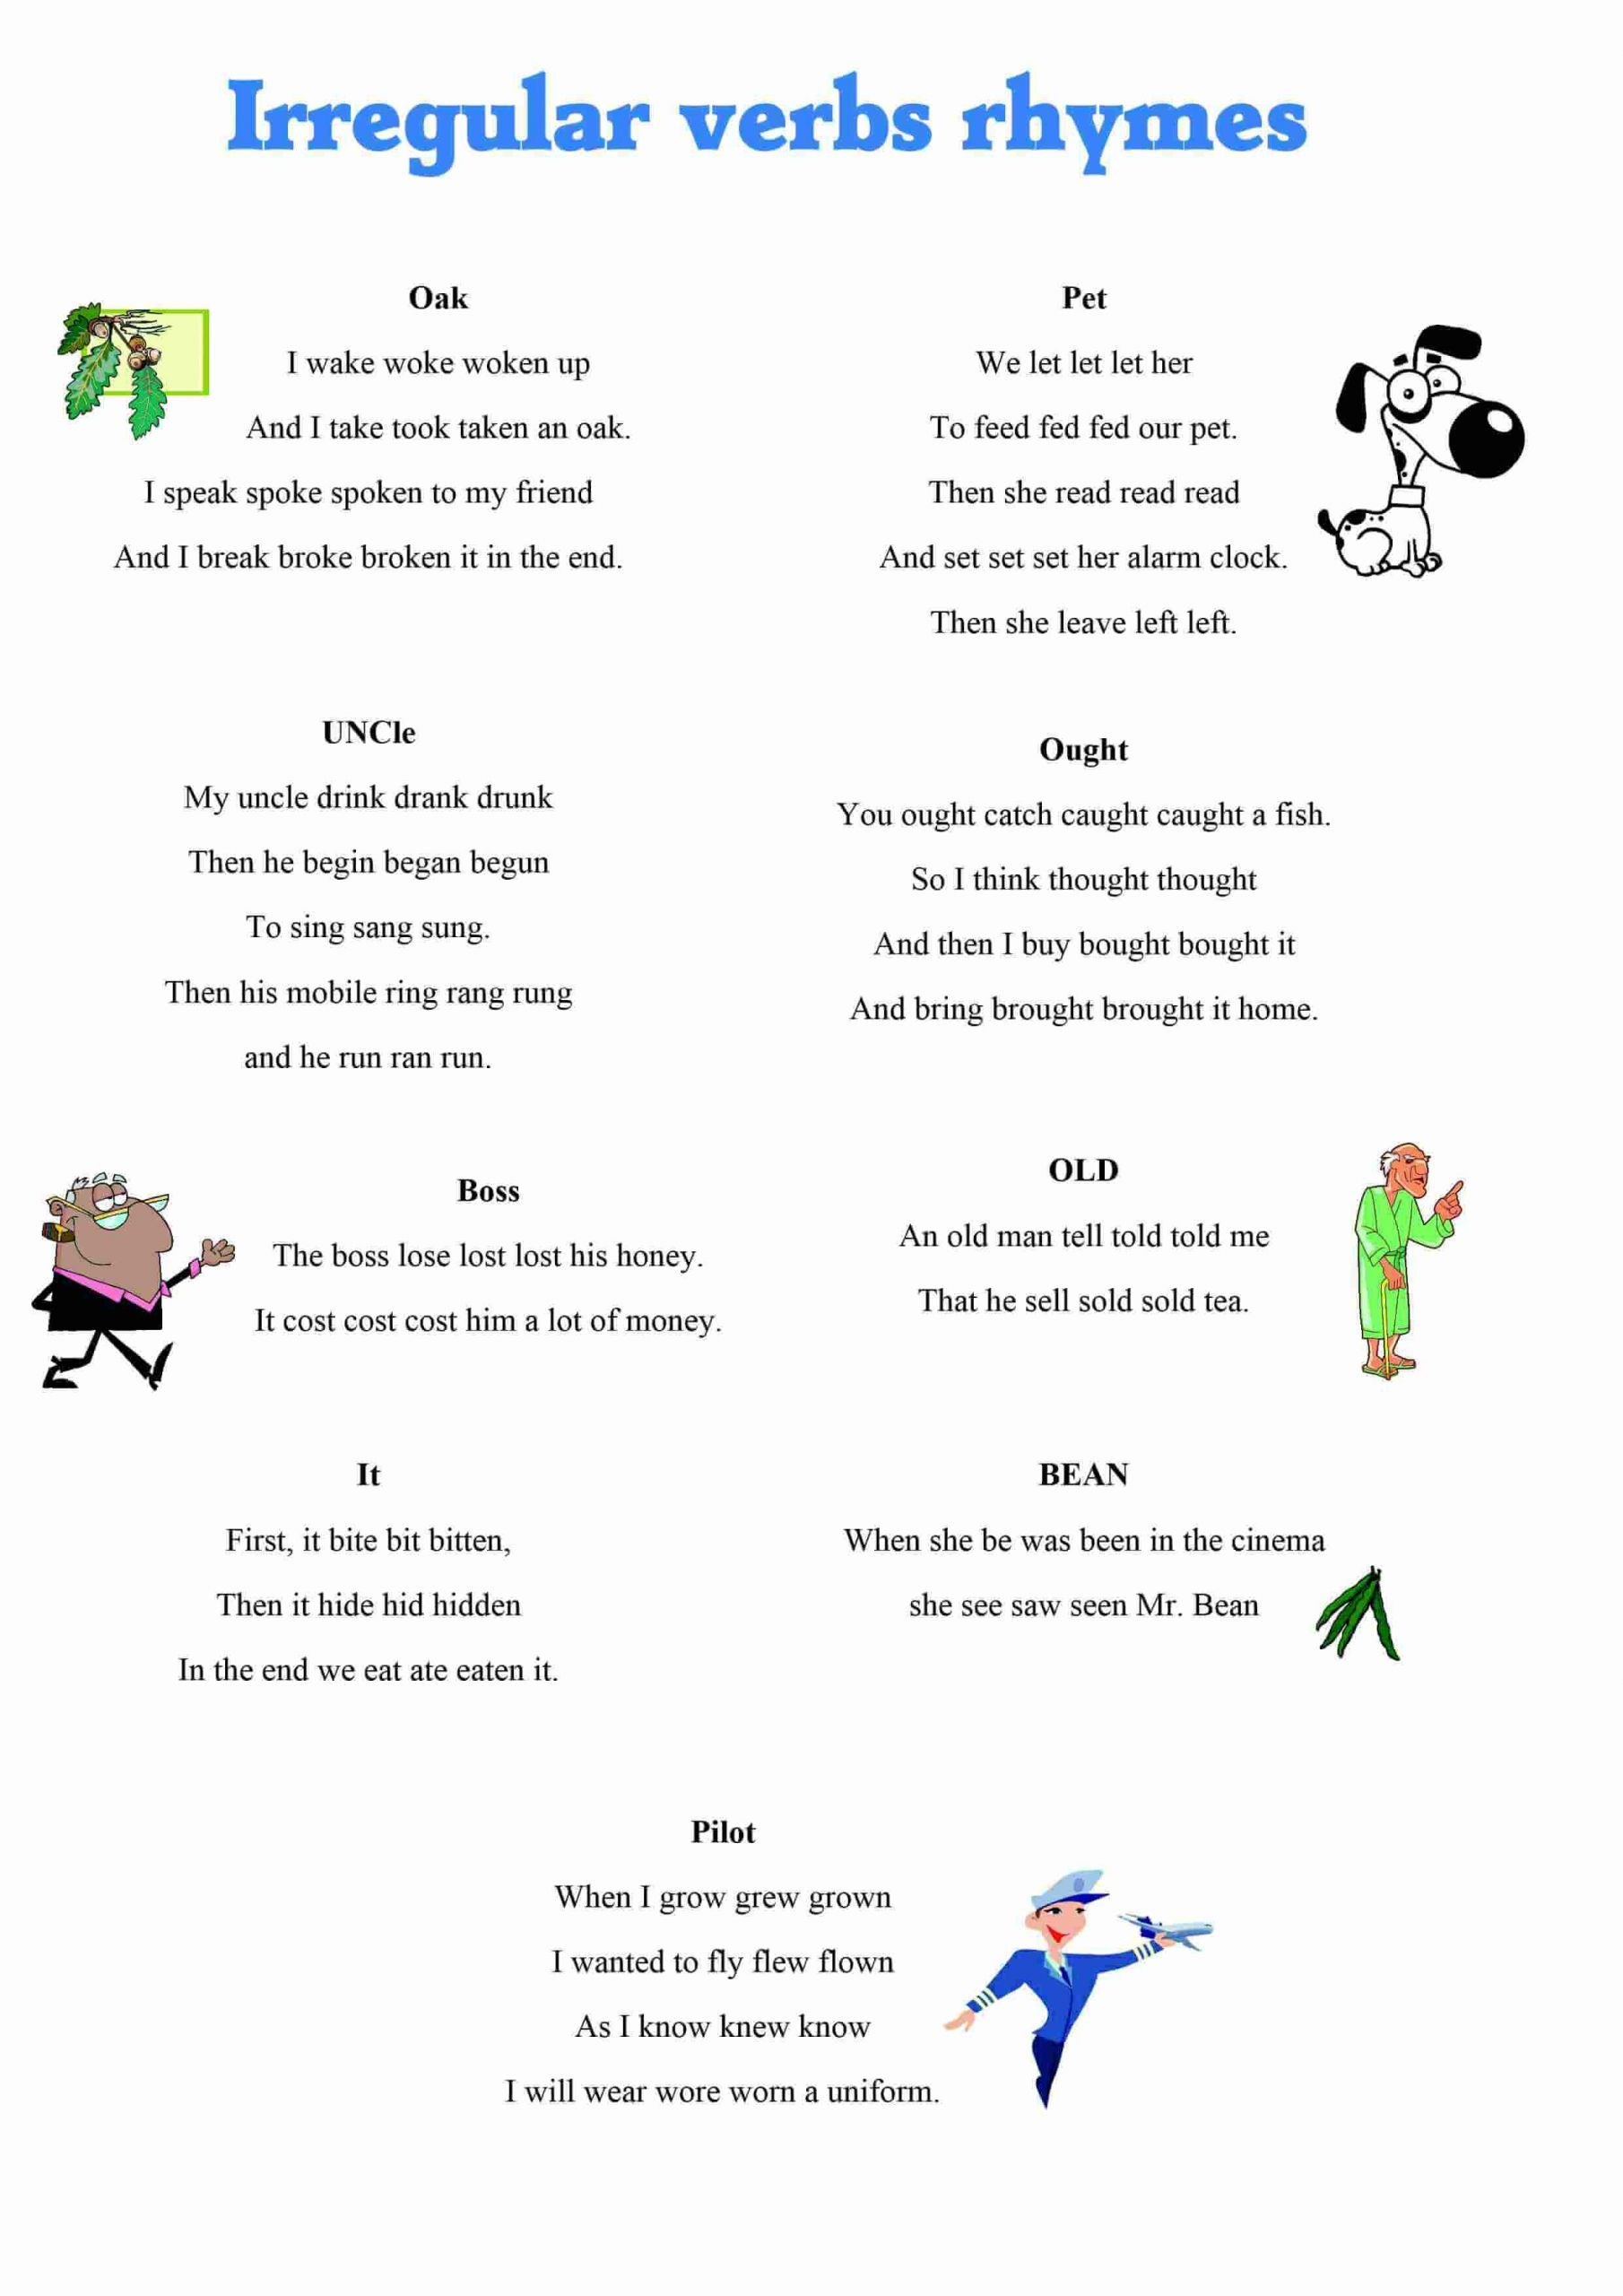 2 English Grammar Tenses Worksheets Irregular Verbs Language Games For Learning English Gramm Irregular Verbs Verb Worksheets Learn English [ 2560 x 1810 Pixel ]